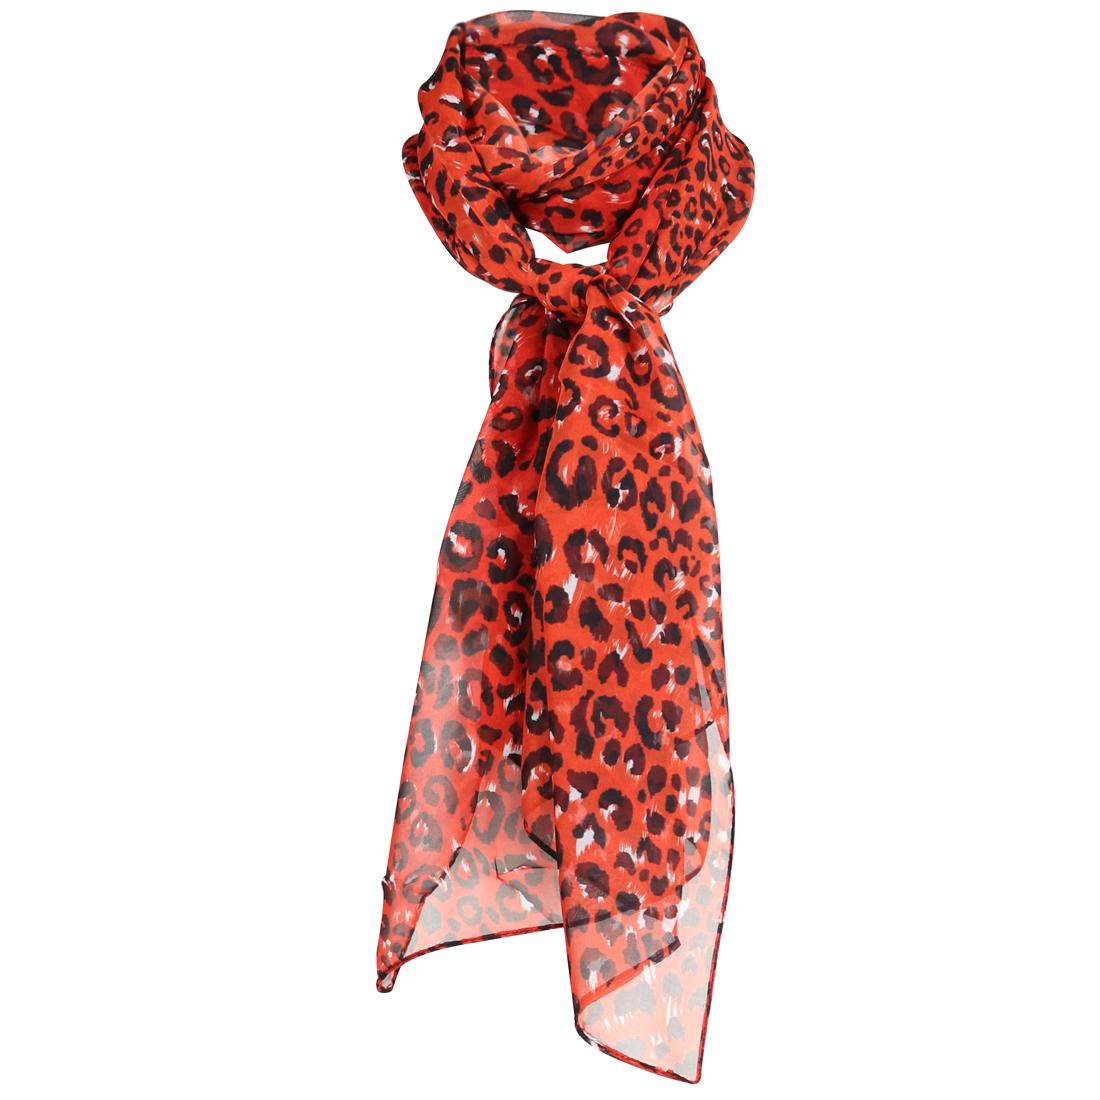 Romano accessoire 84905-1 in het Rood